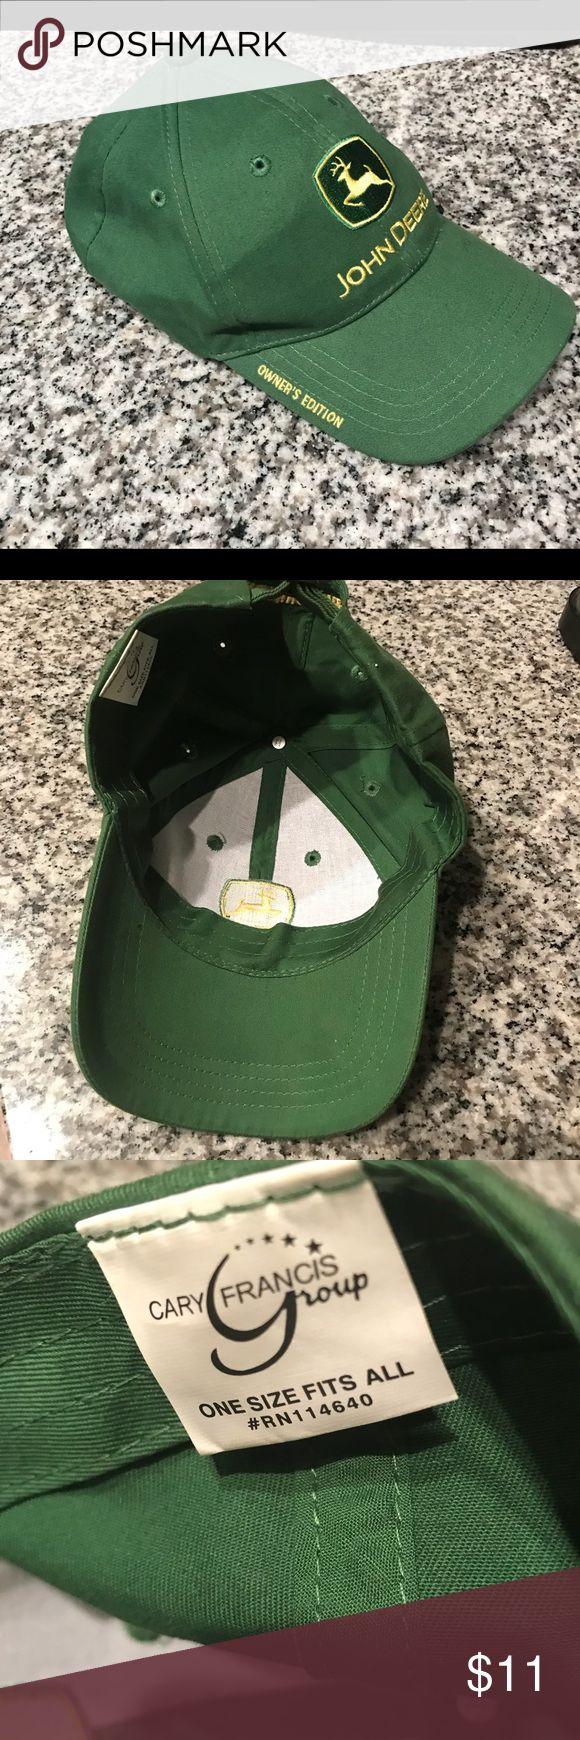 John Deere Owners edition green cap John Deere Owners edition green cap. 'Nothing runs like a Deere in the back and Adjustable strap. Nwot John Deere Accessories Hats